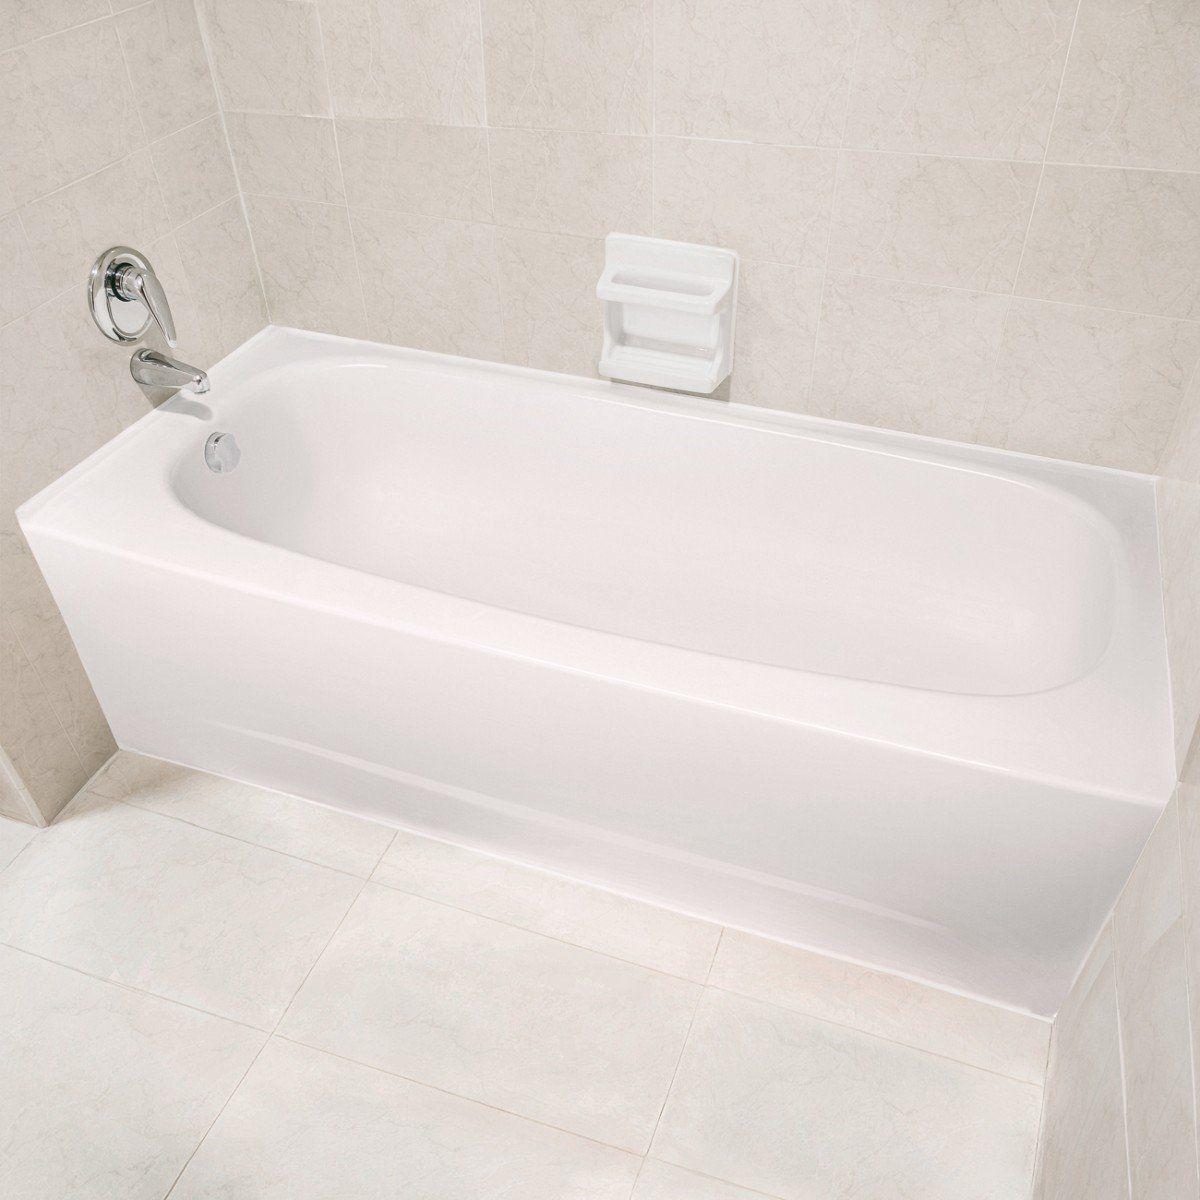 Porcelain Soaking Tub Kohler